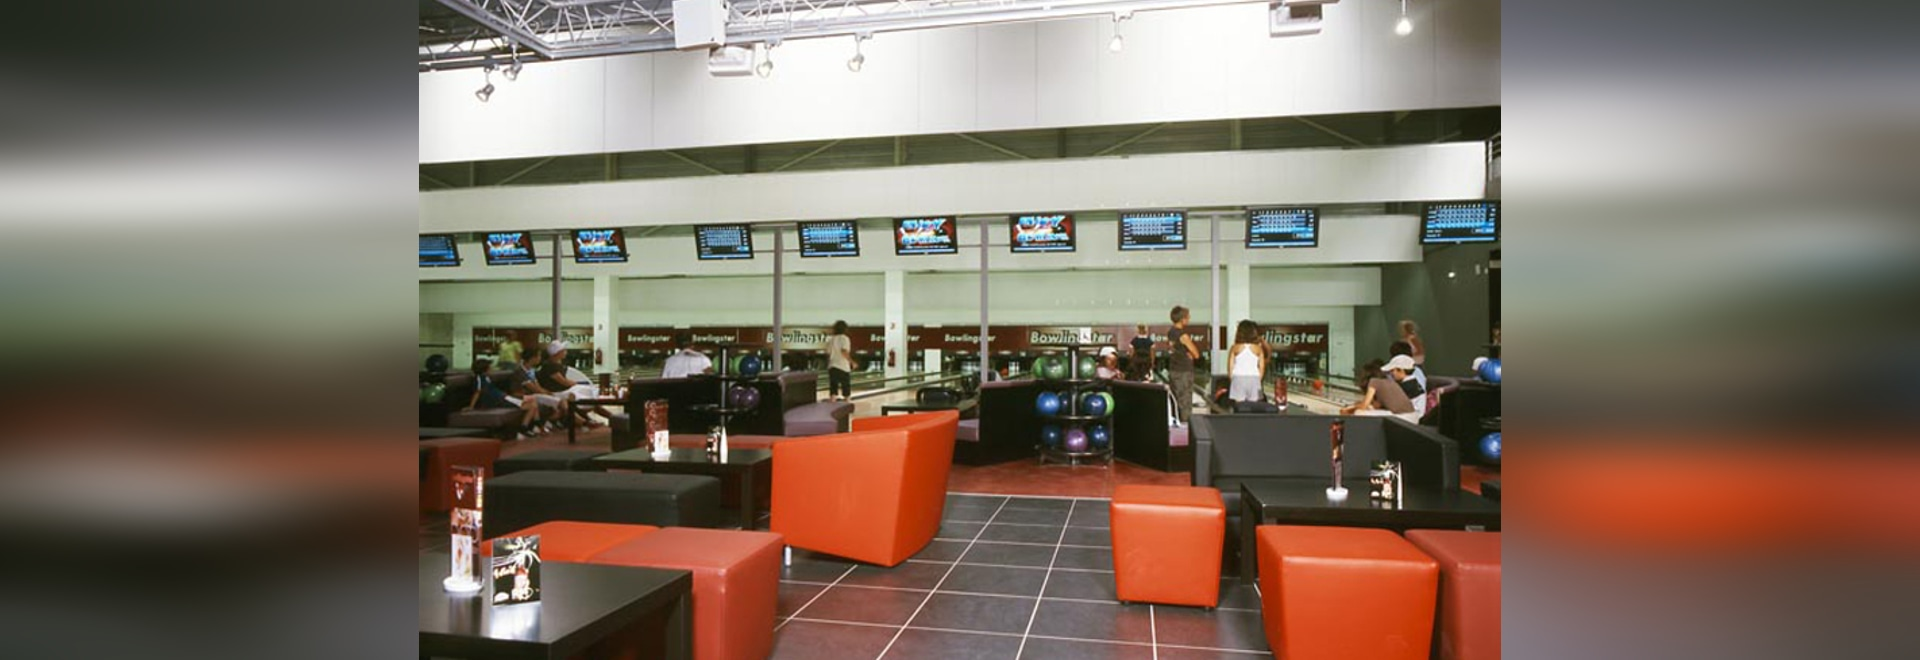 Bowlingspiel – Valvert